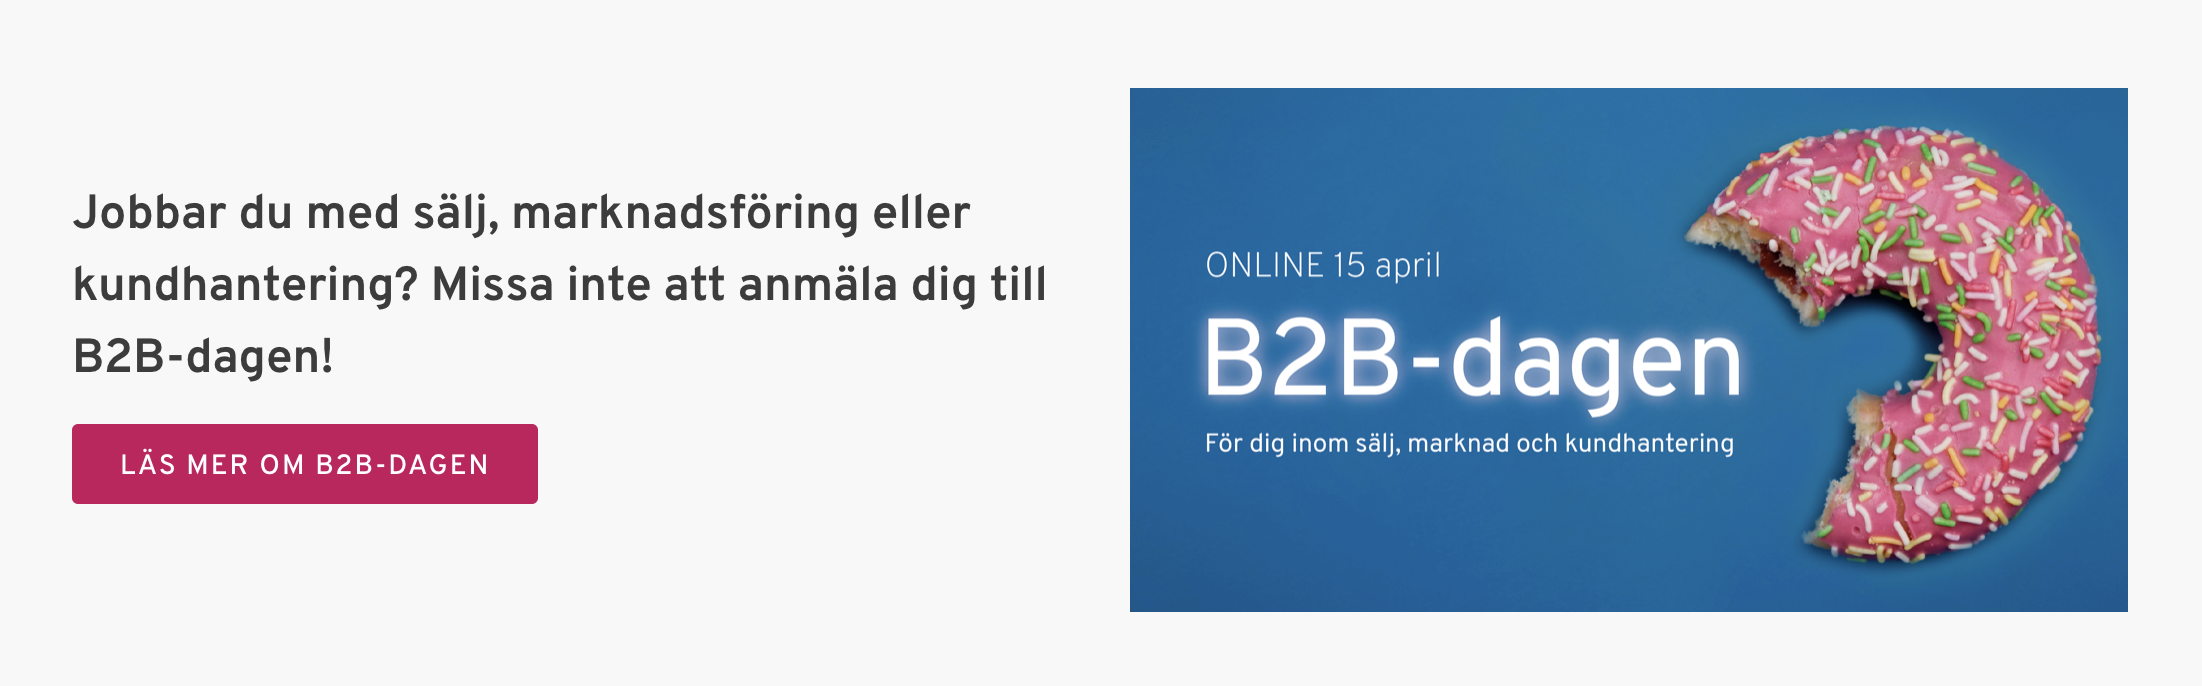 b2b-dagen